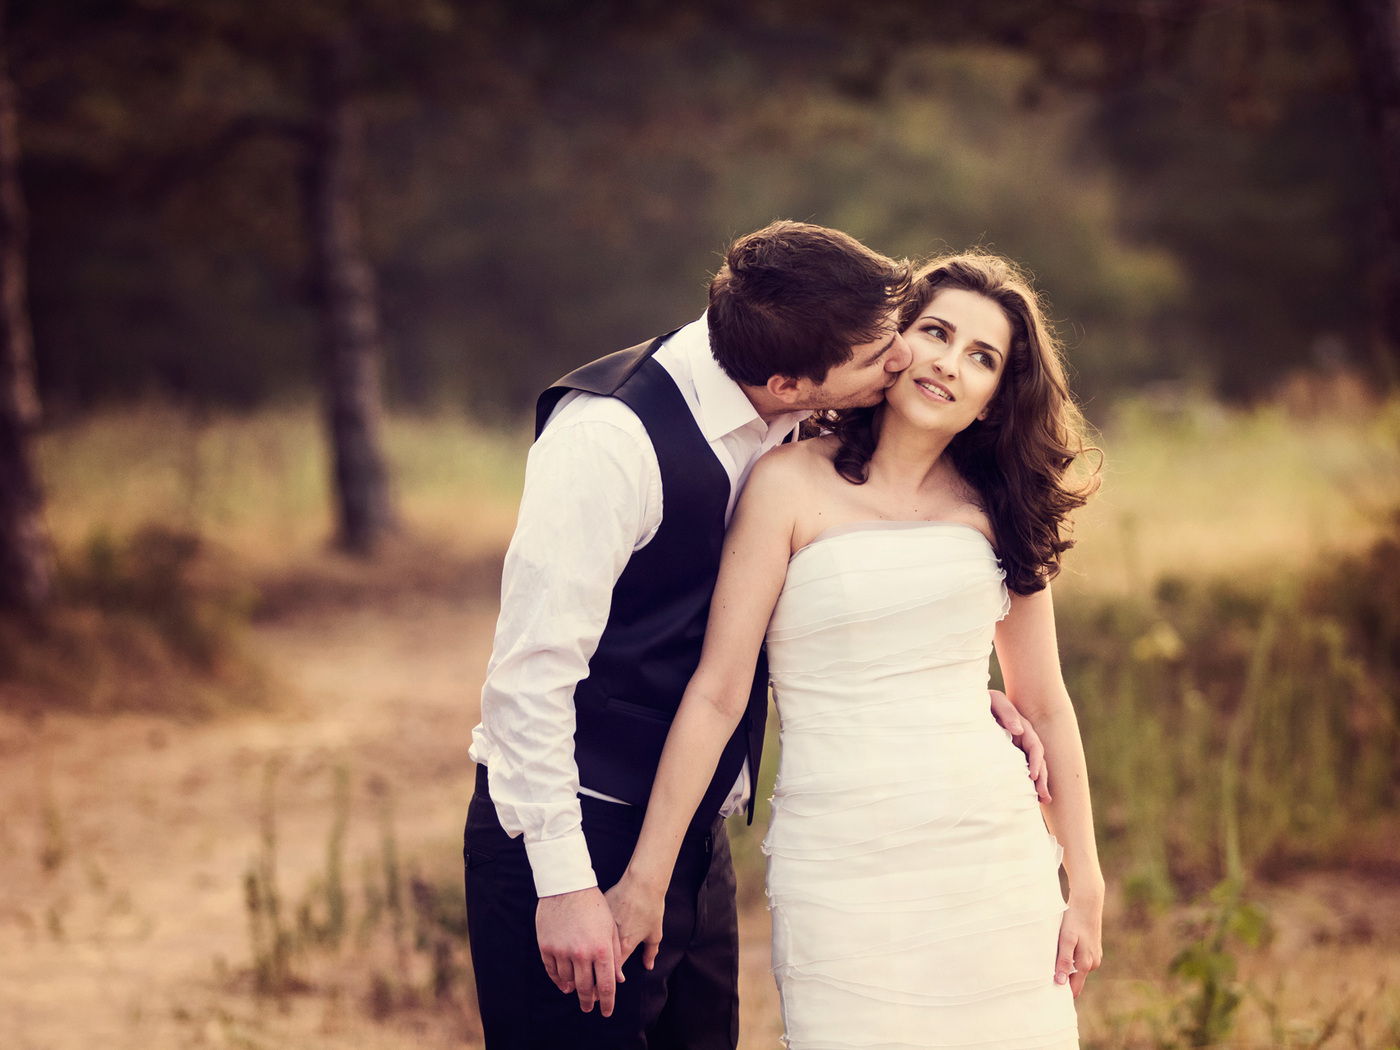 couple-kissing-image.jpg